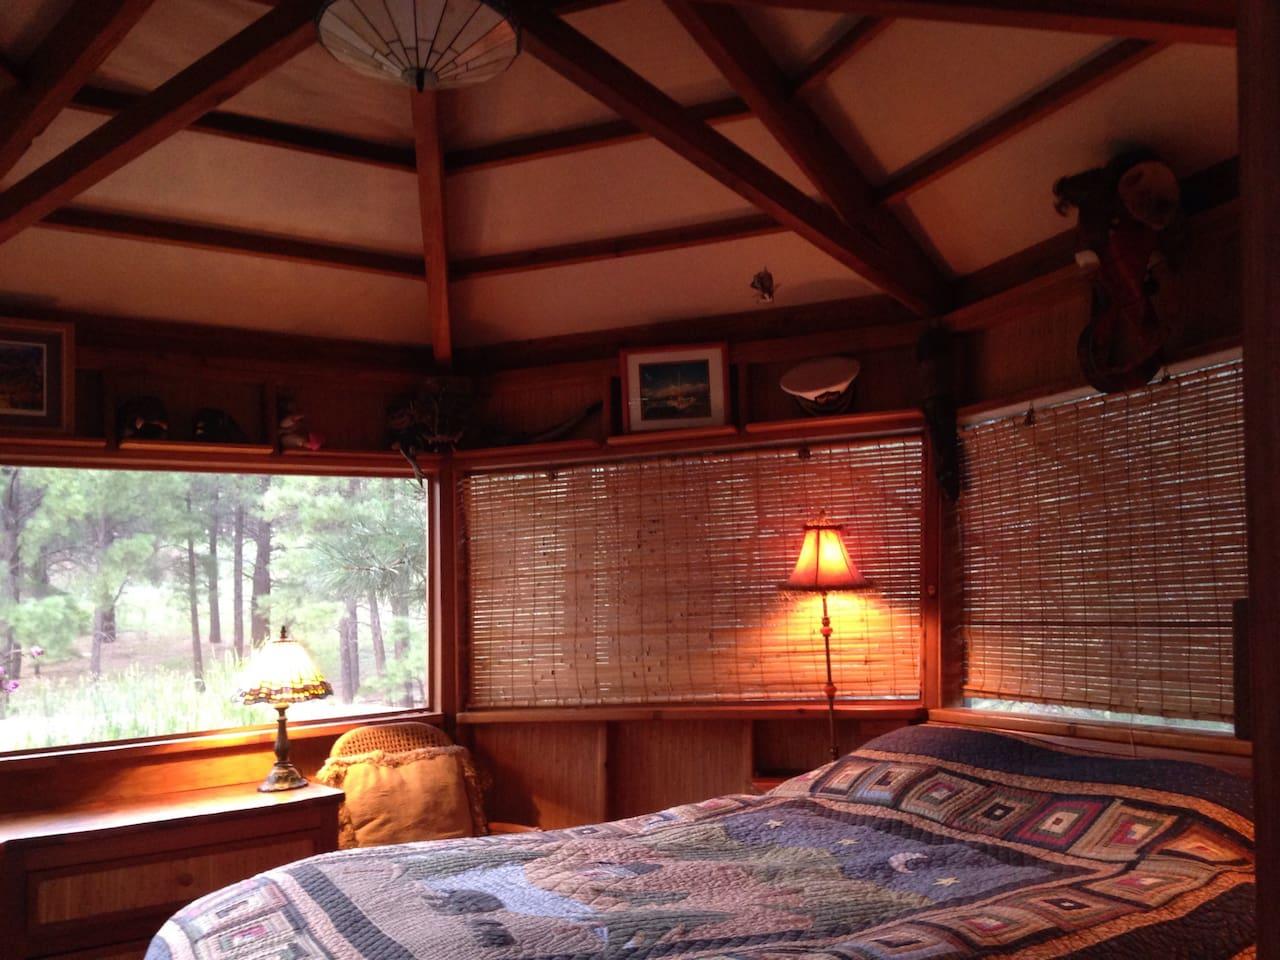 Inside of 7 sided cabana bedroom